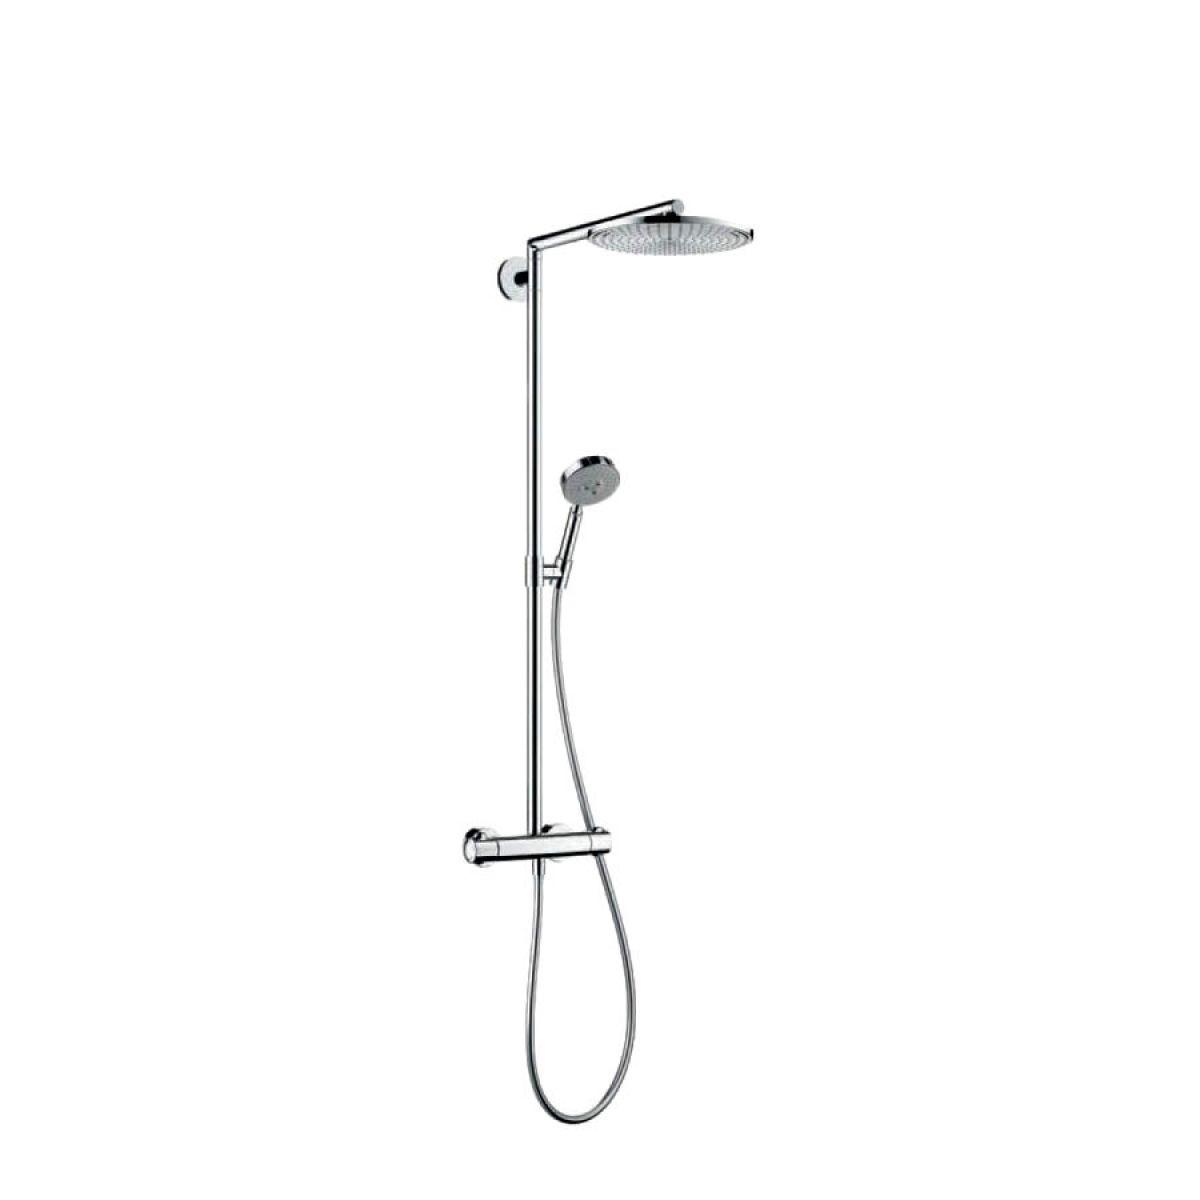 Hansgrohe raindance showerpipe 300 with 460mm shower arm uk bathrooms - Hansgrohe shower arm ...